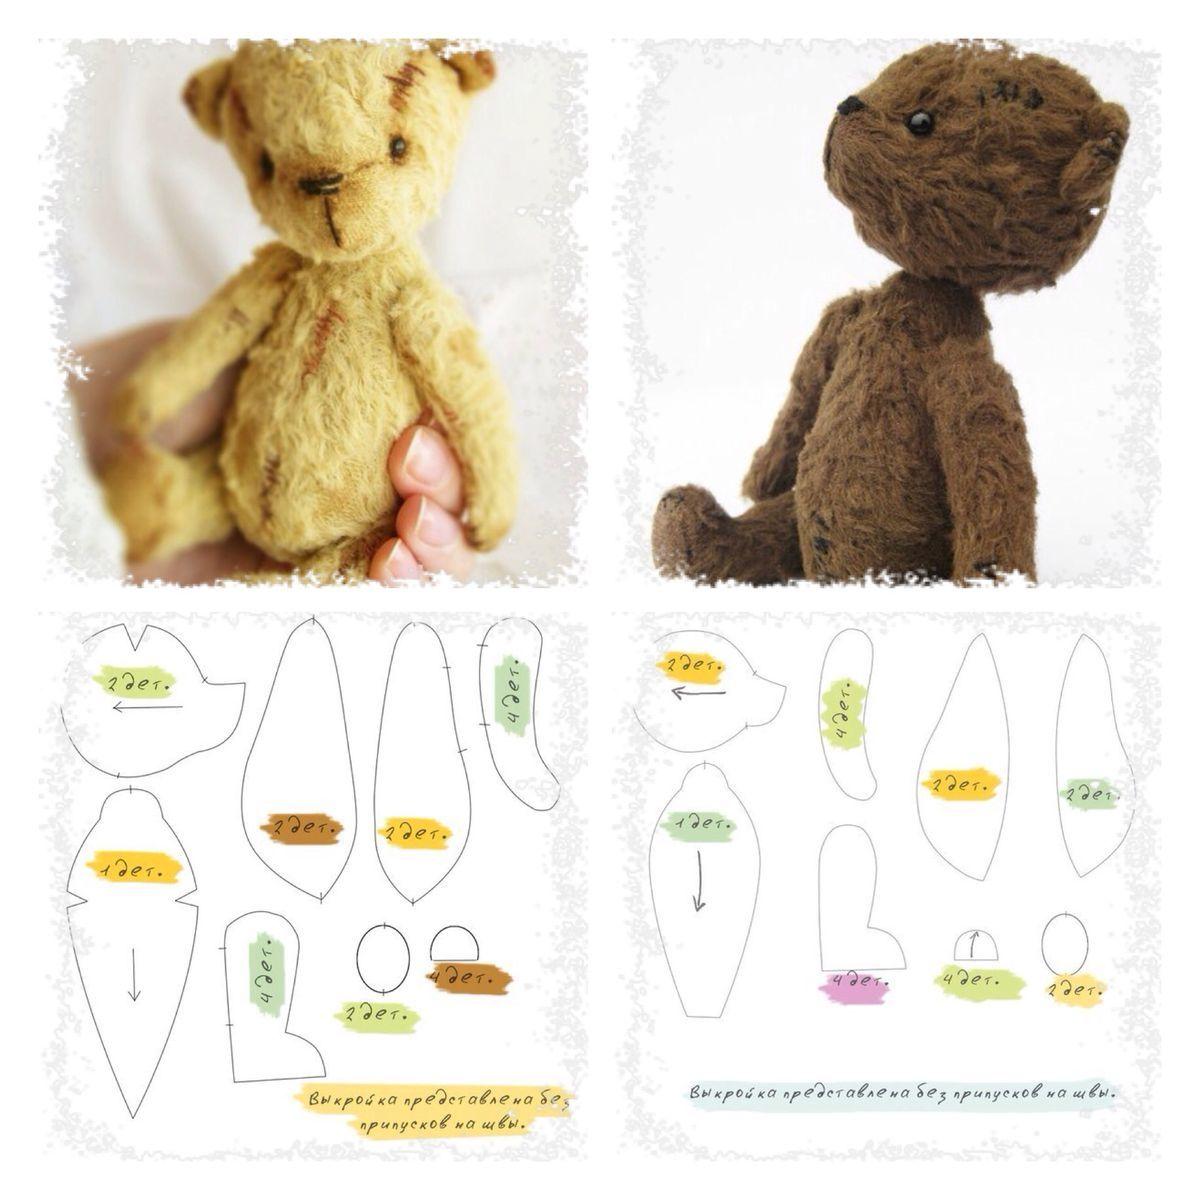 149e6ec066f86e353f007005645157fbg 12001200 pixels teddy teddy bear jeuxipadfo Choice Image